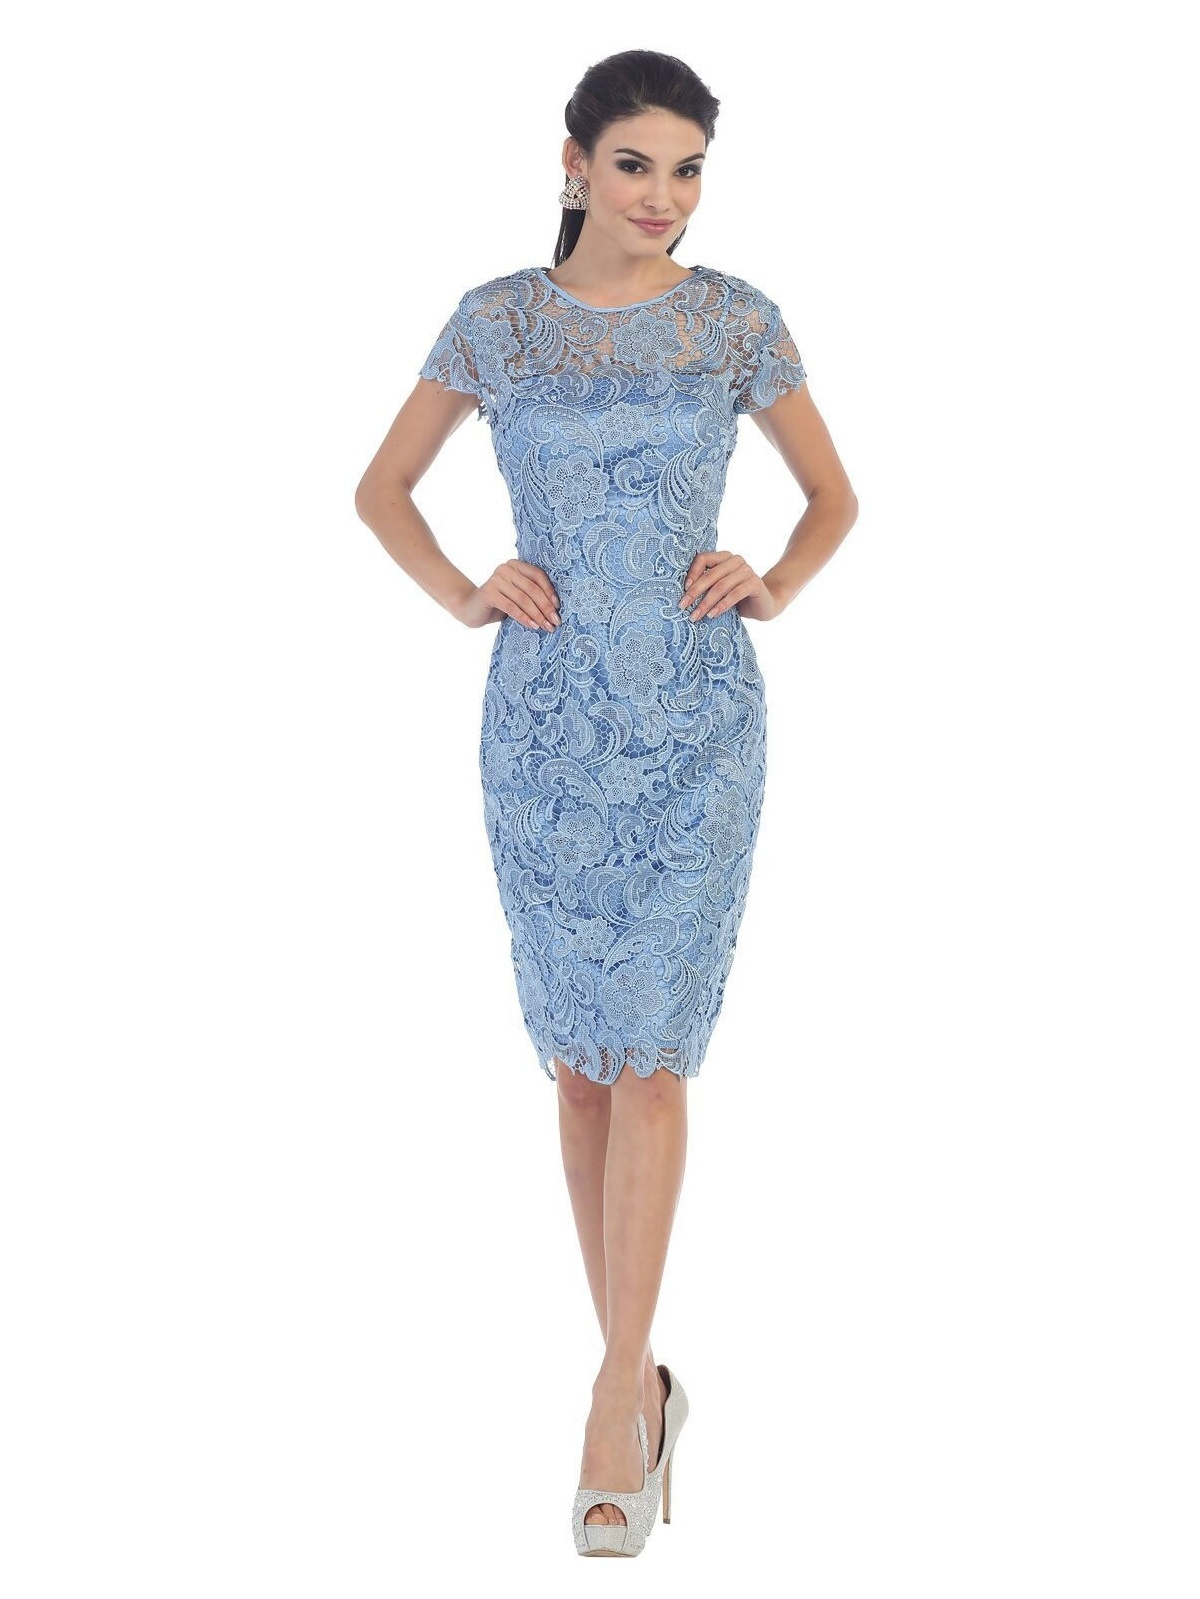 Short Plus Size Mother of the Bride Dress 2018 - Walmart.com